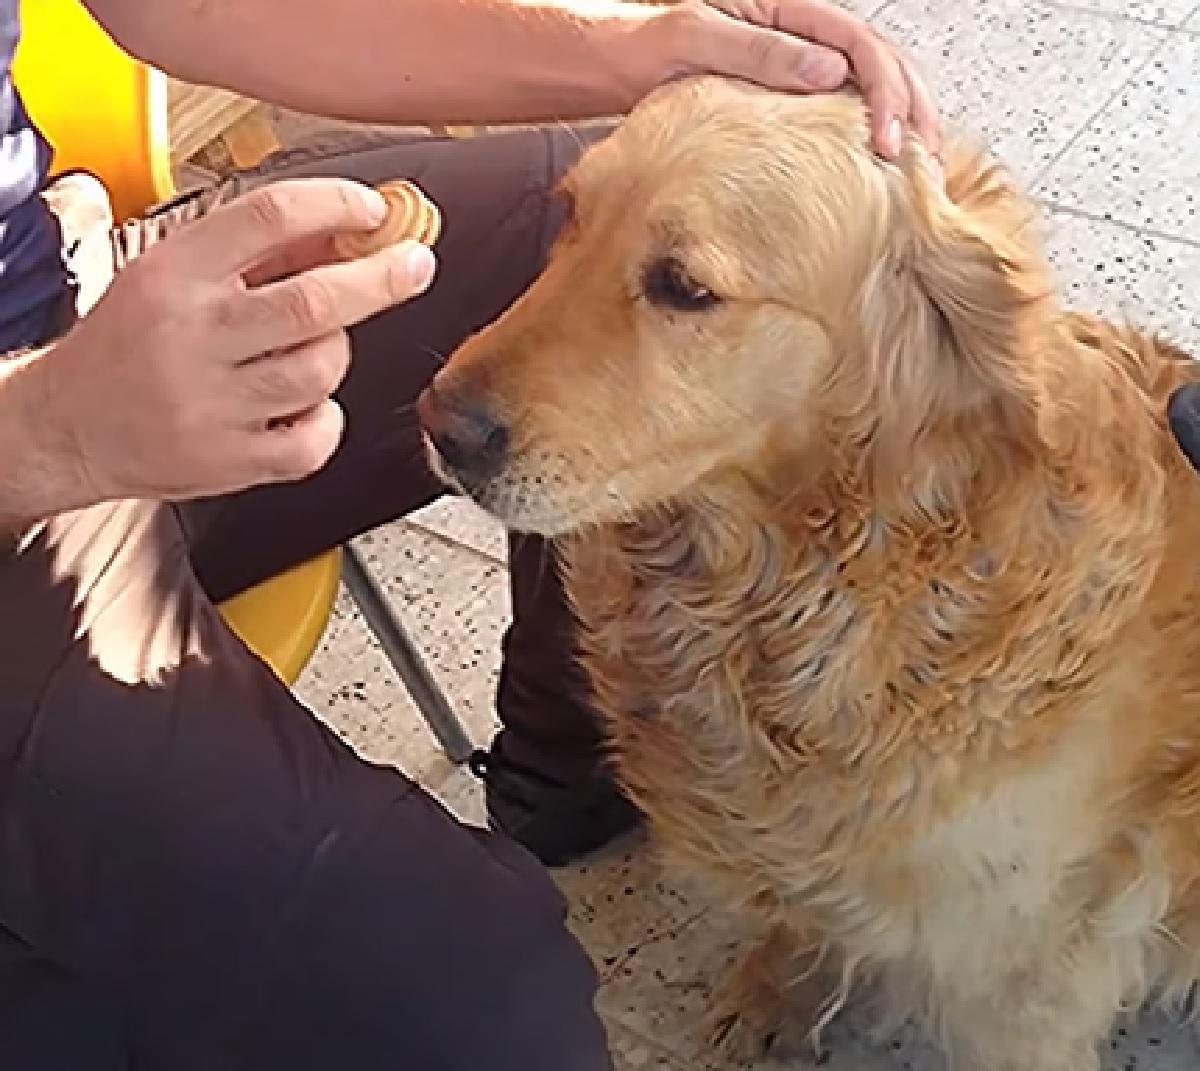 cucciolo golden attesa trucco